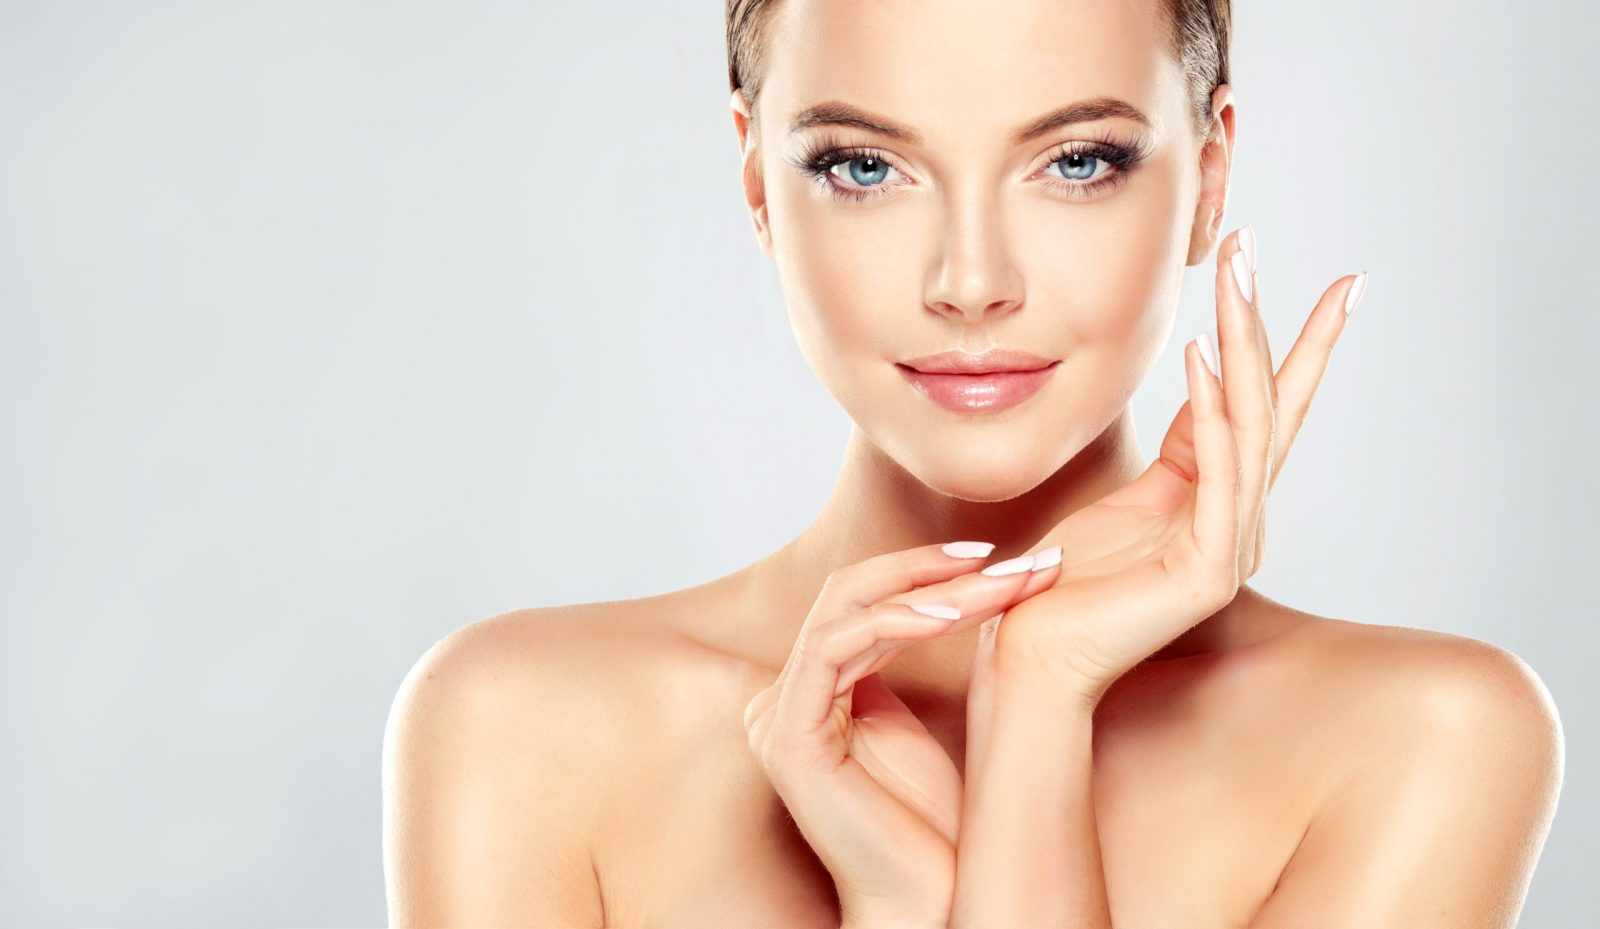 beautiful skin facial prgf treatment photo